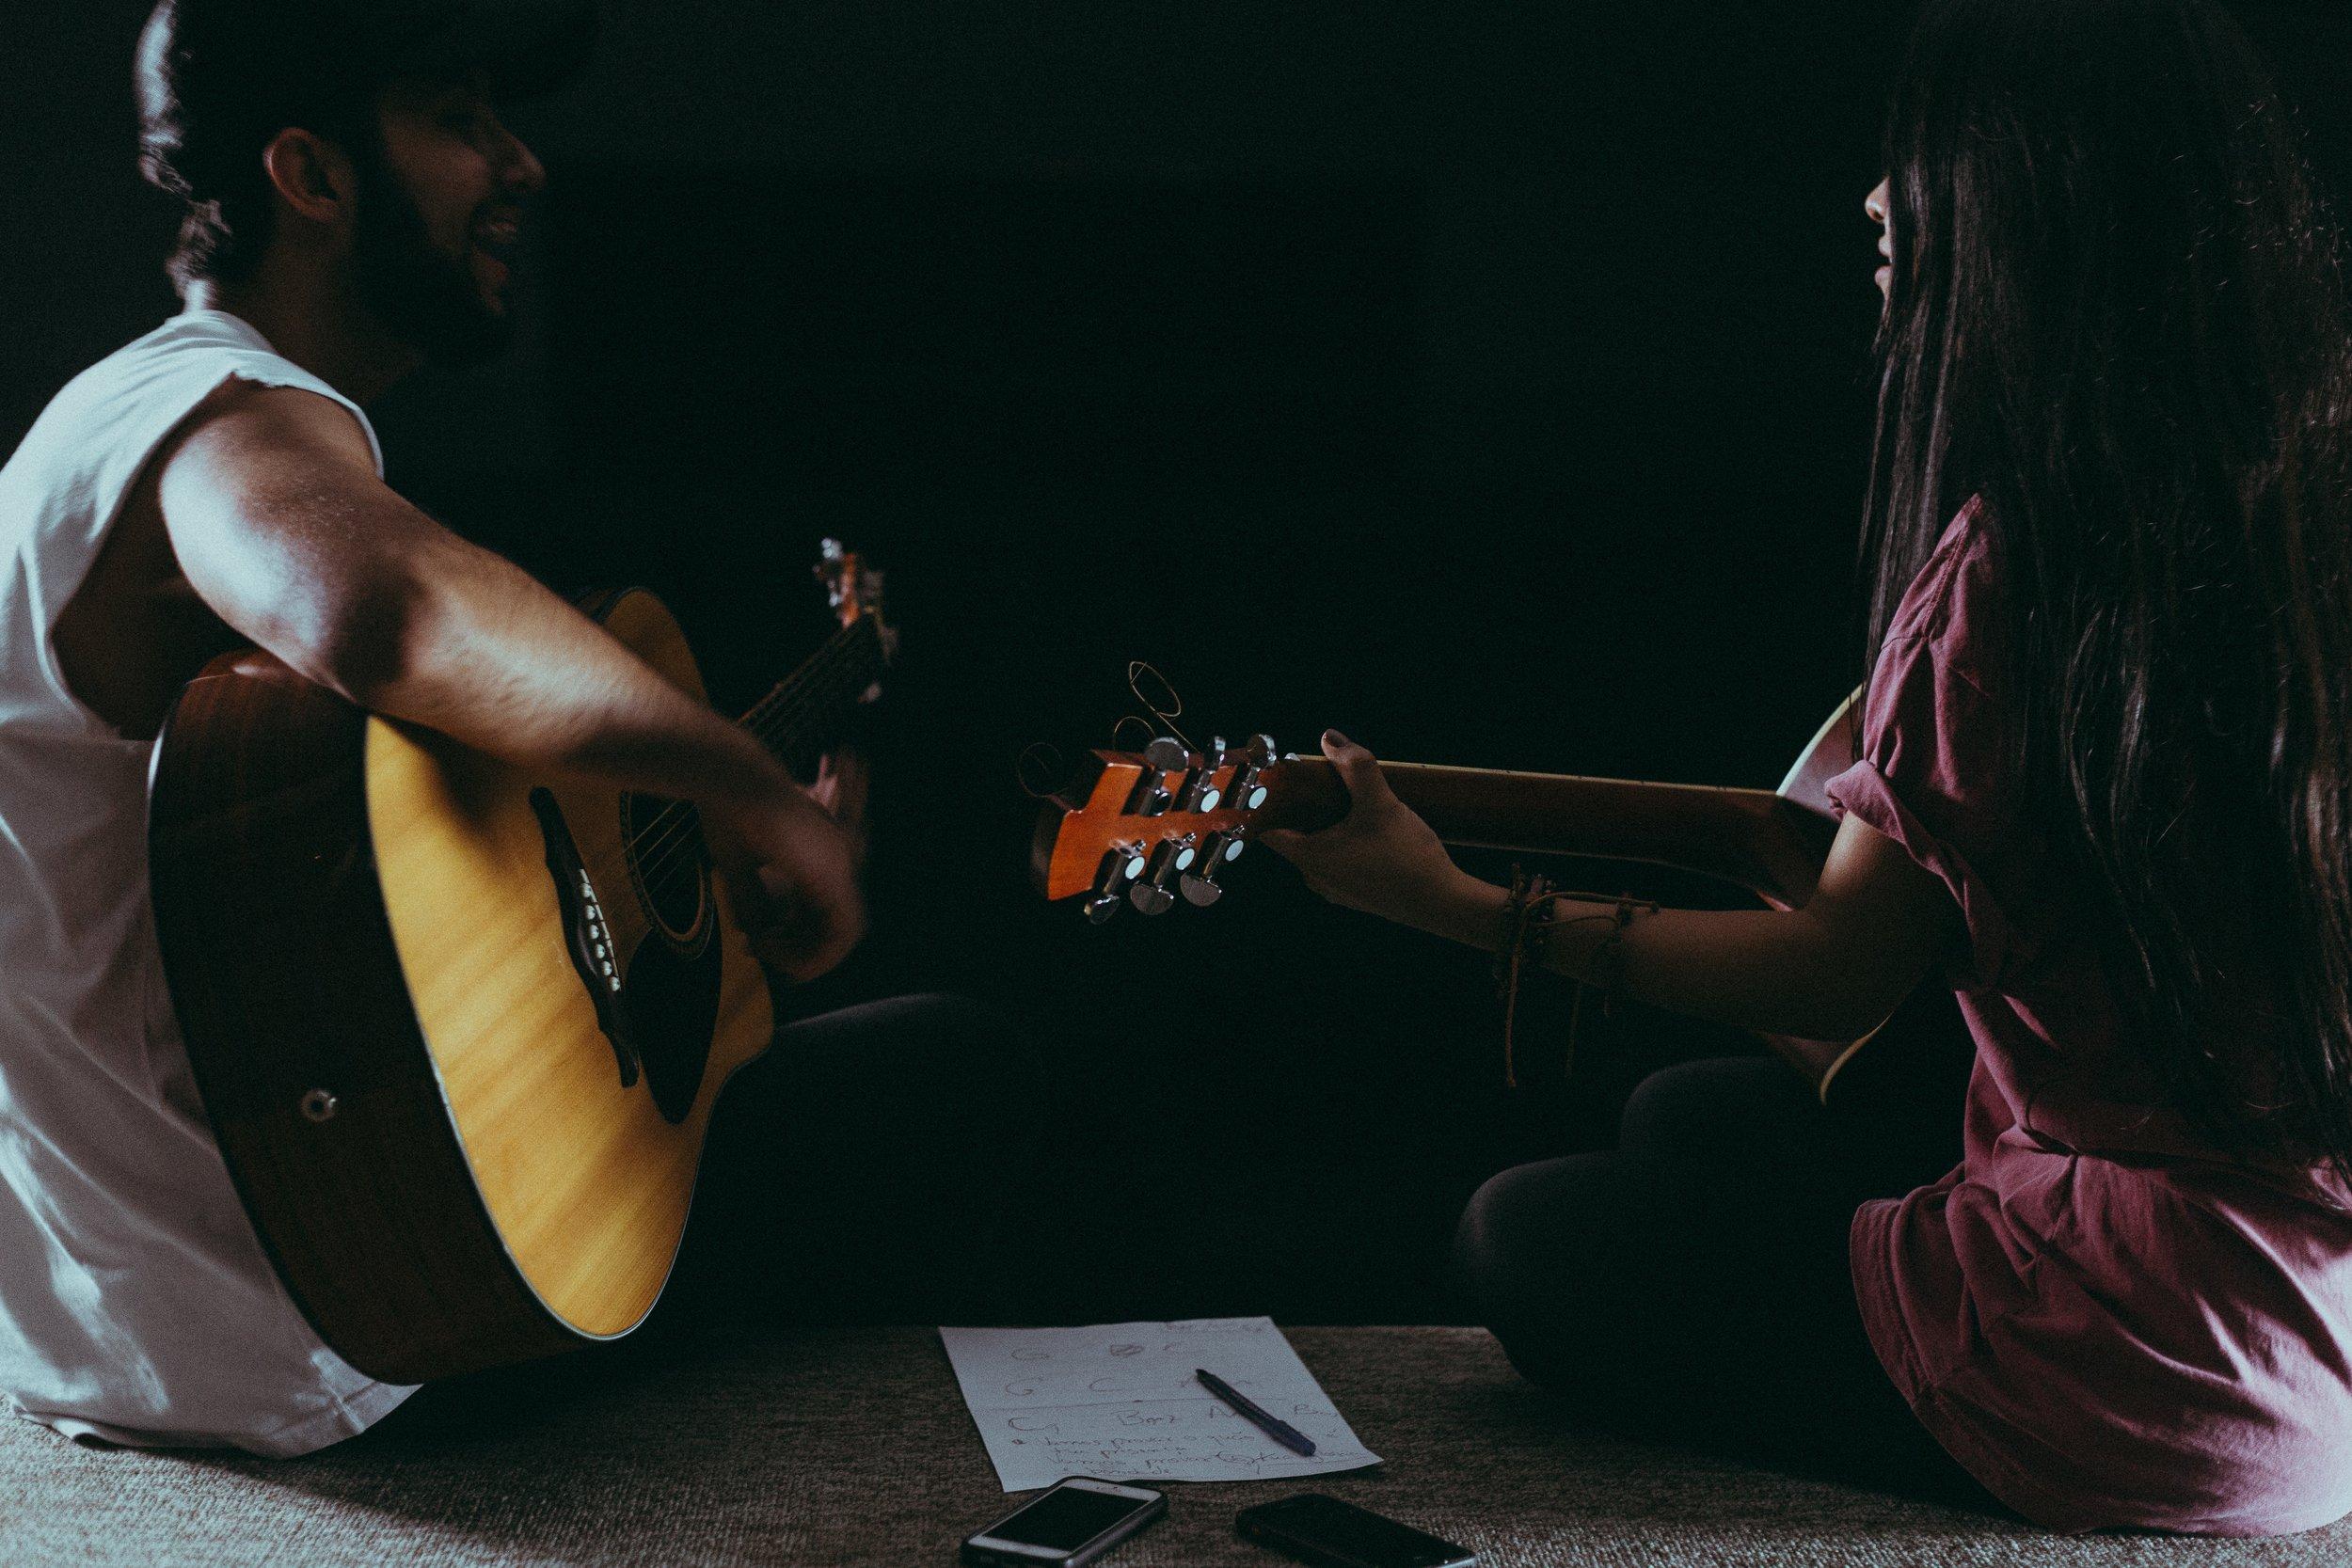 acoustic-guitar-cellphone-close-up-1164763.jpg